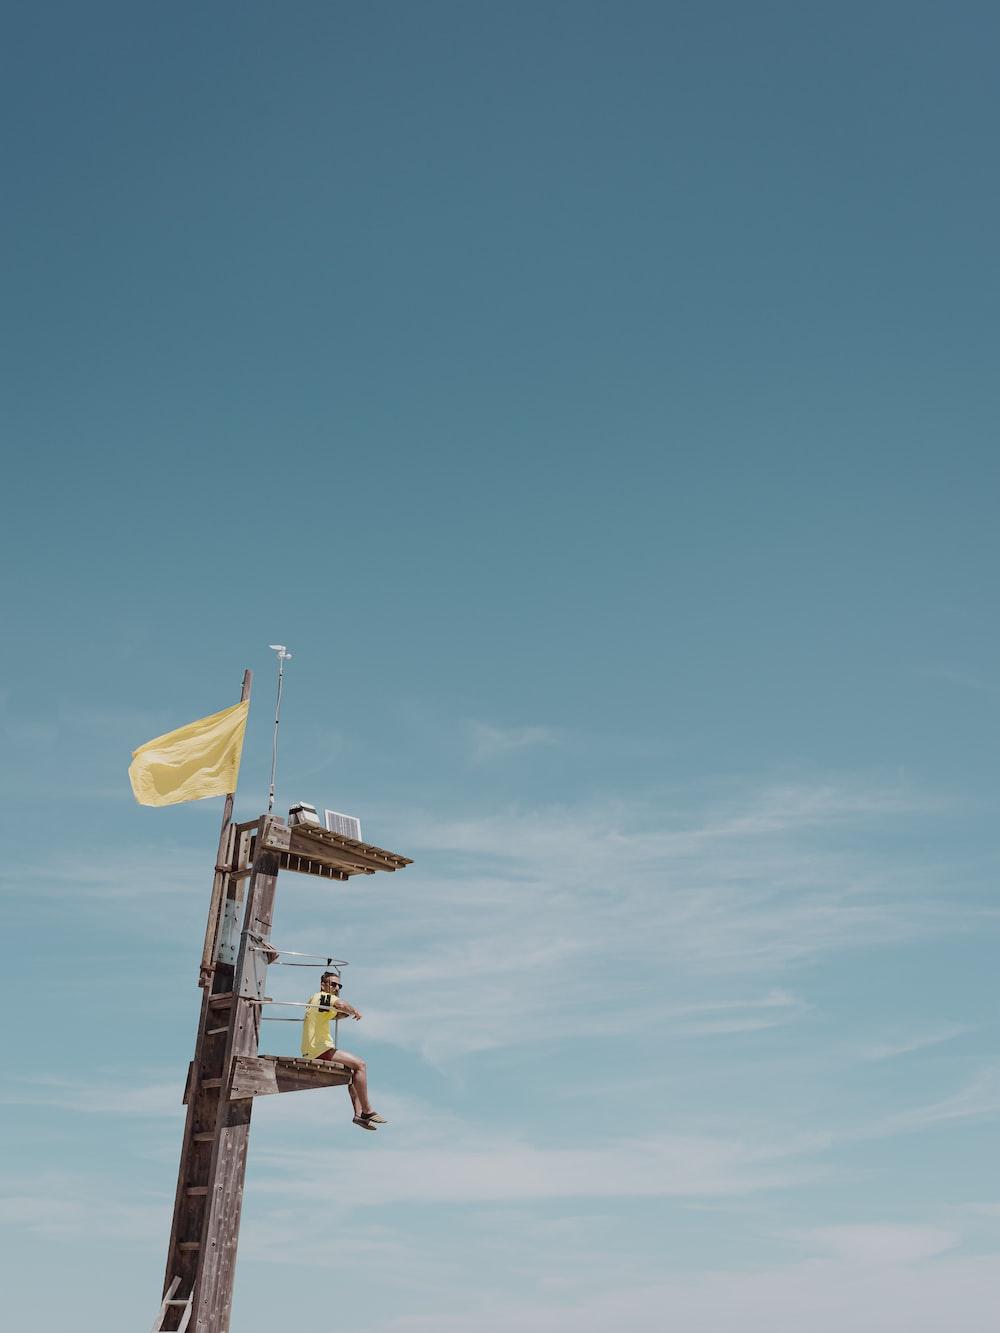 2 men riding on yellow and white plane during daytime